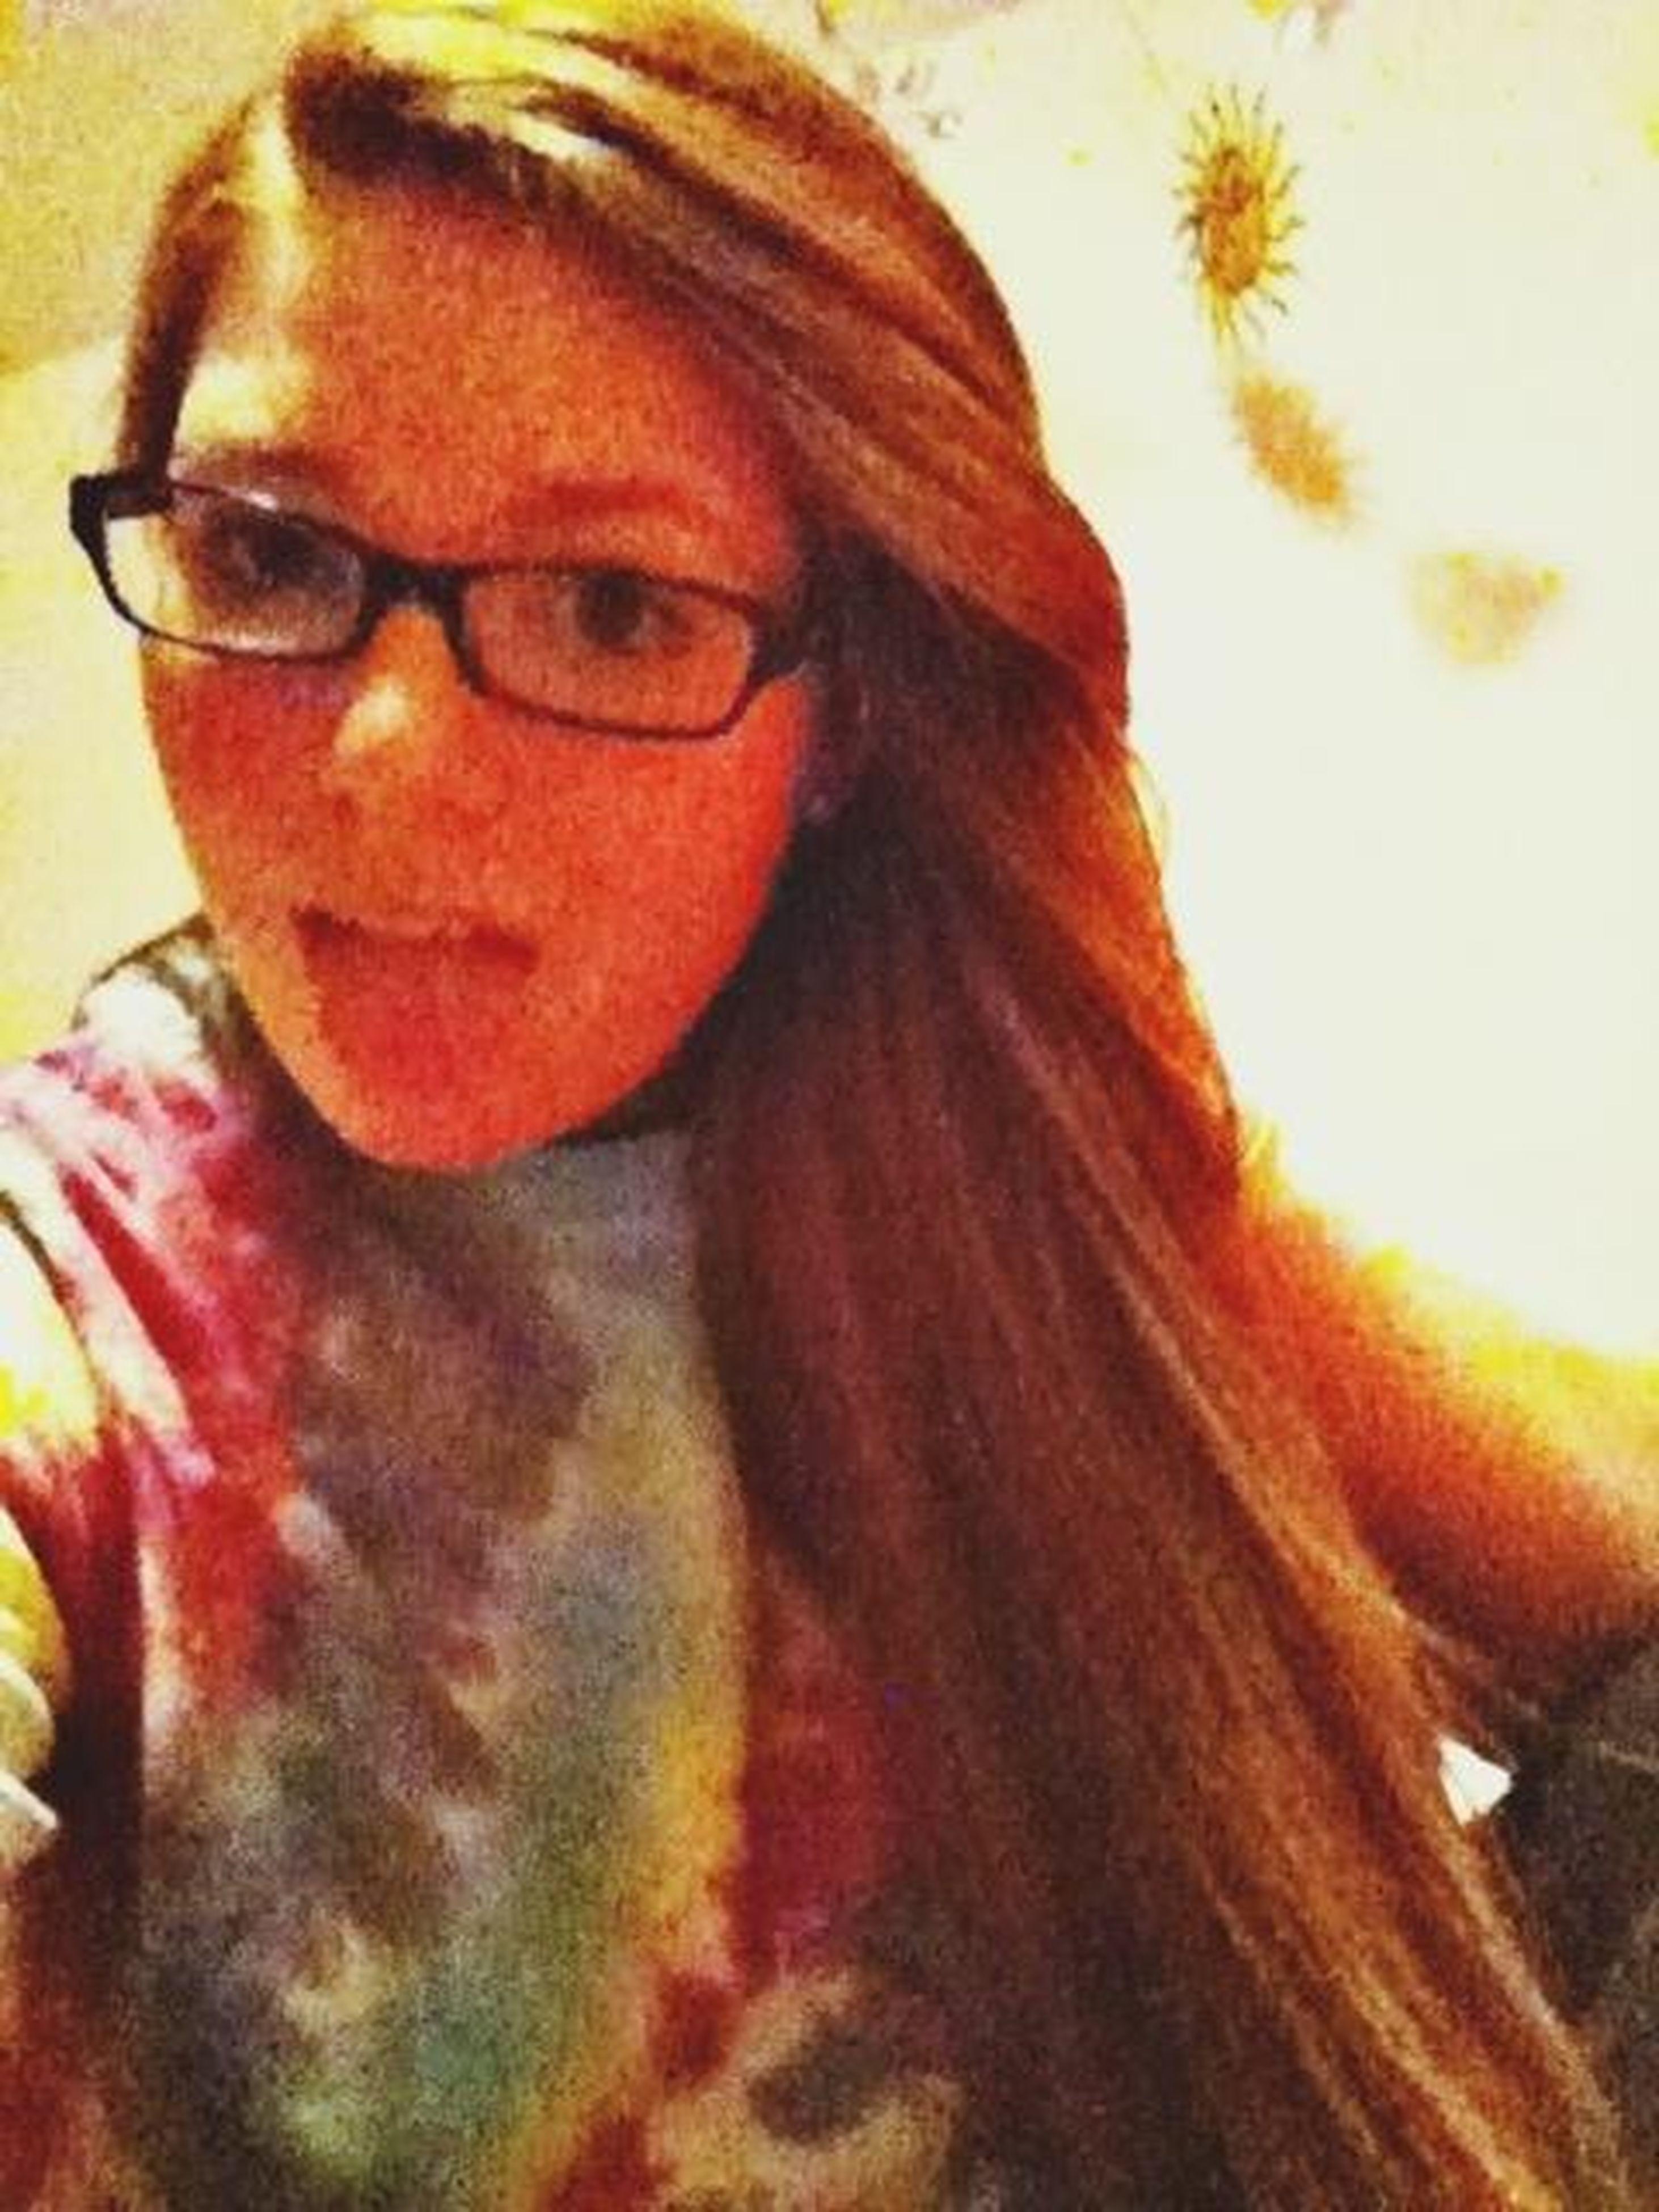 straight hair for days